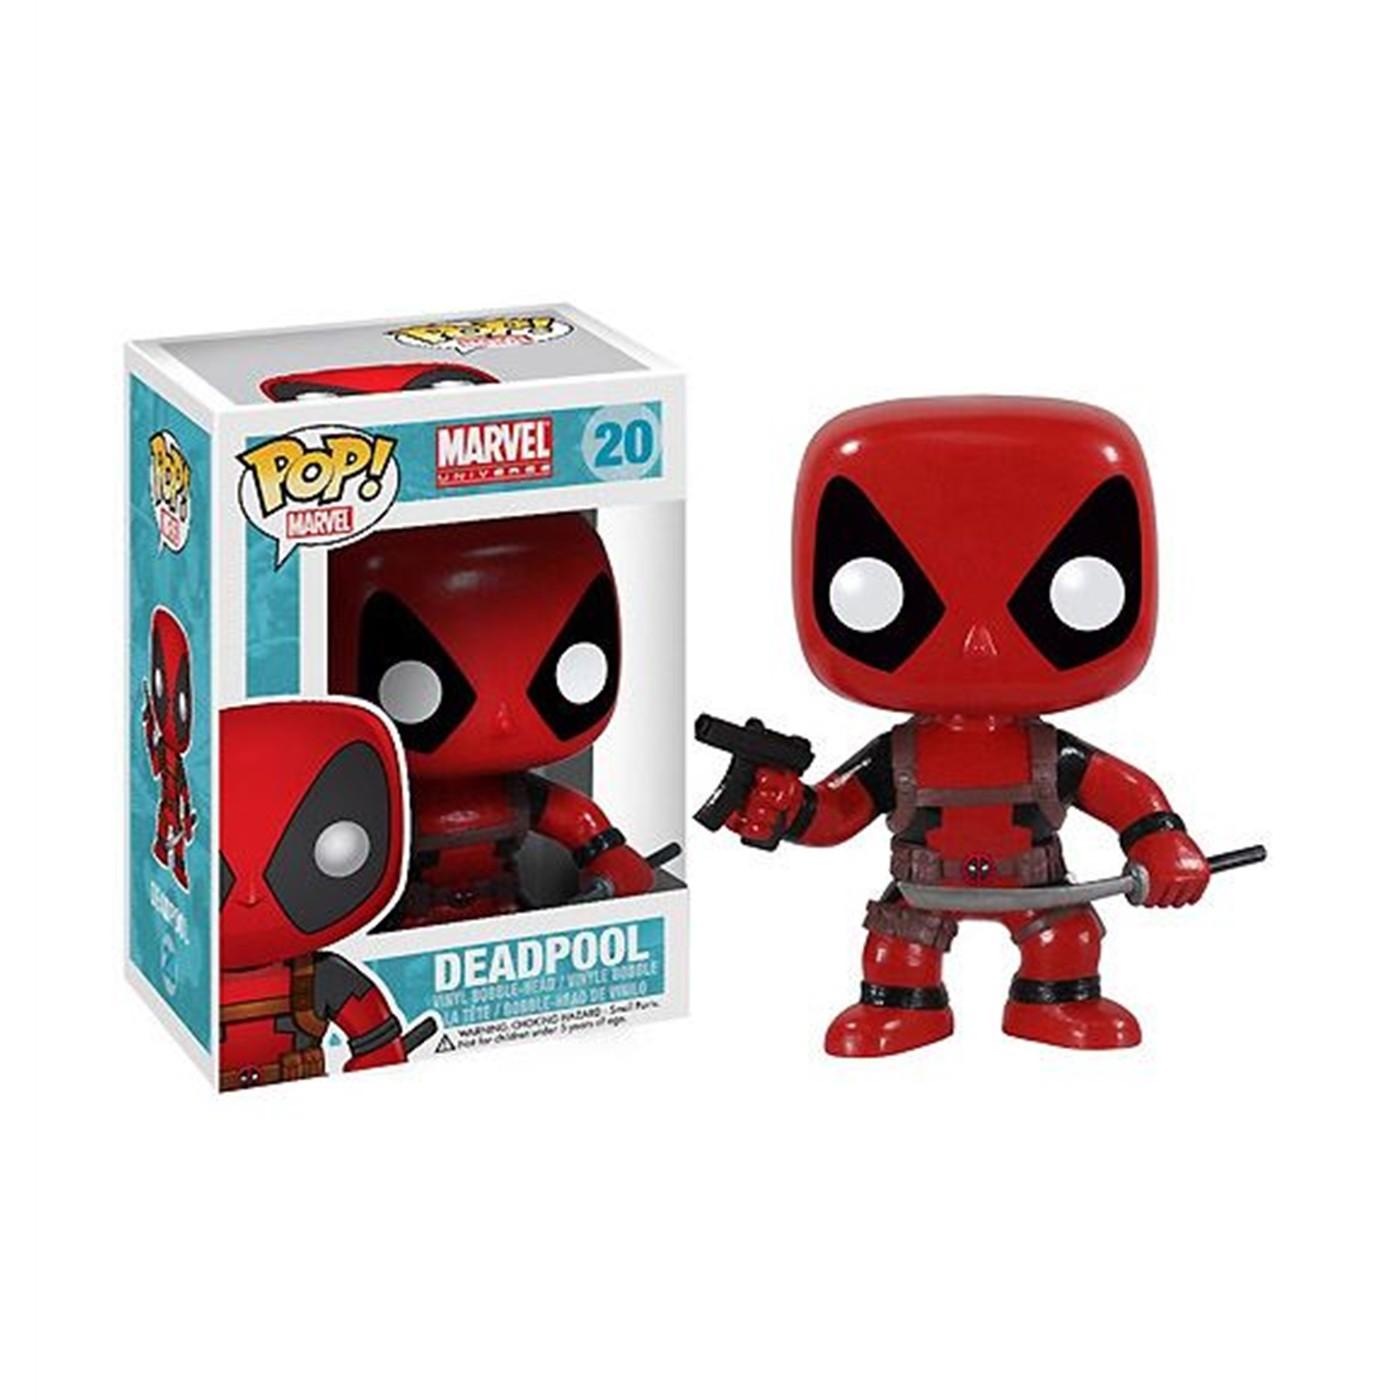 Deadpool POP Bobble Head